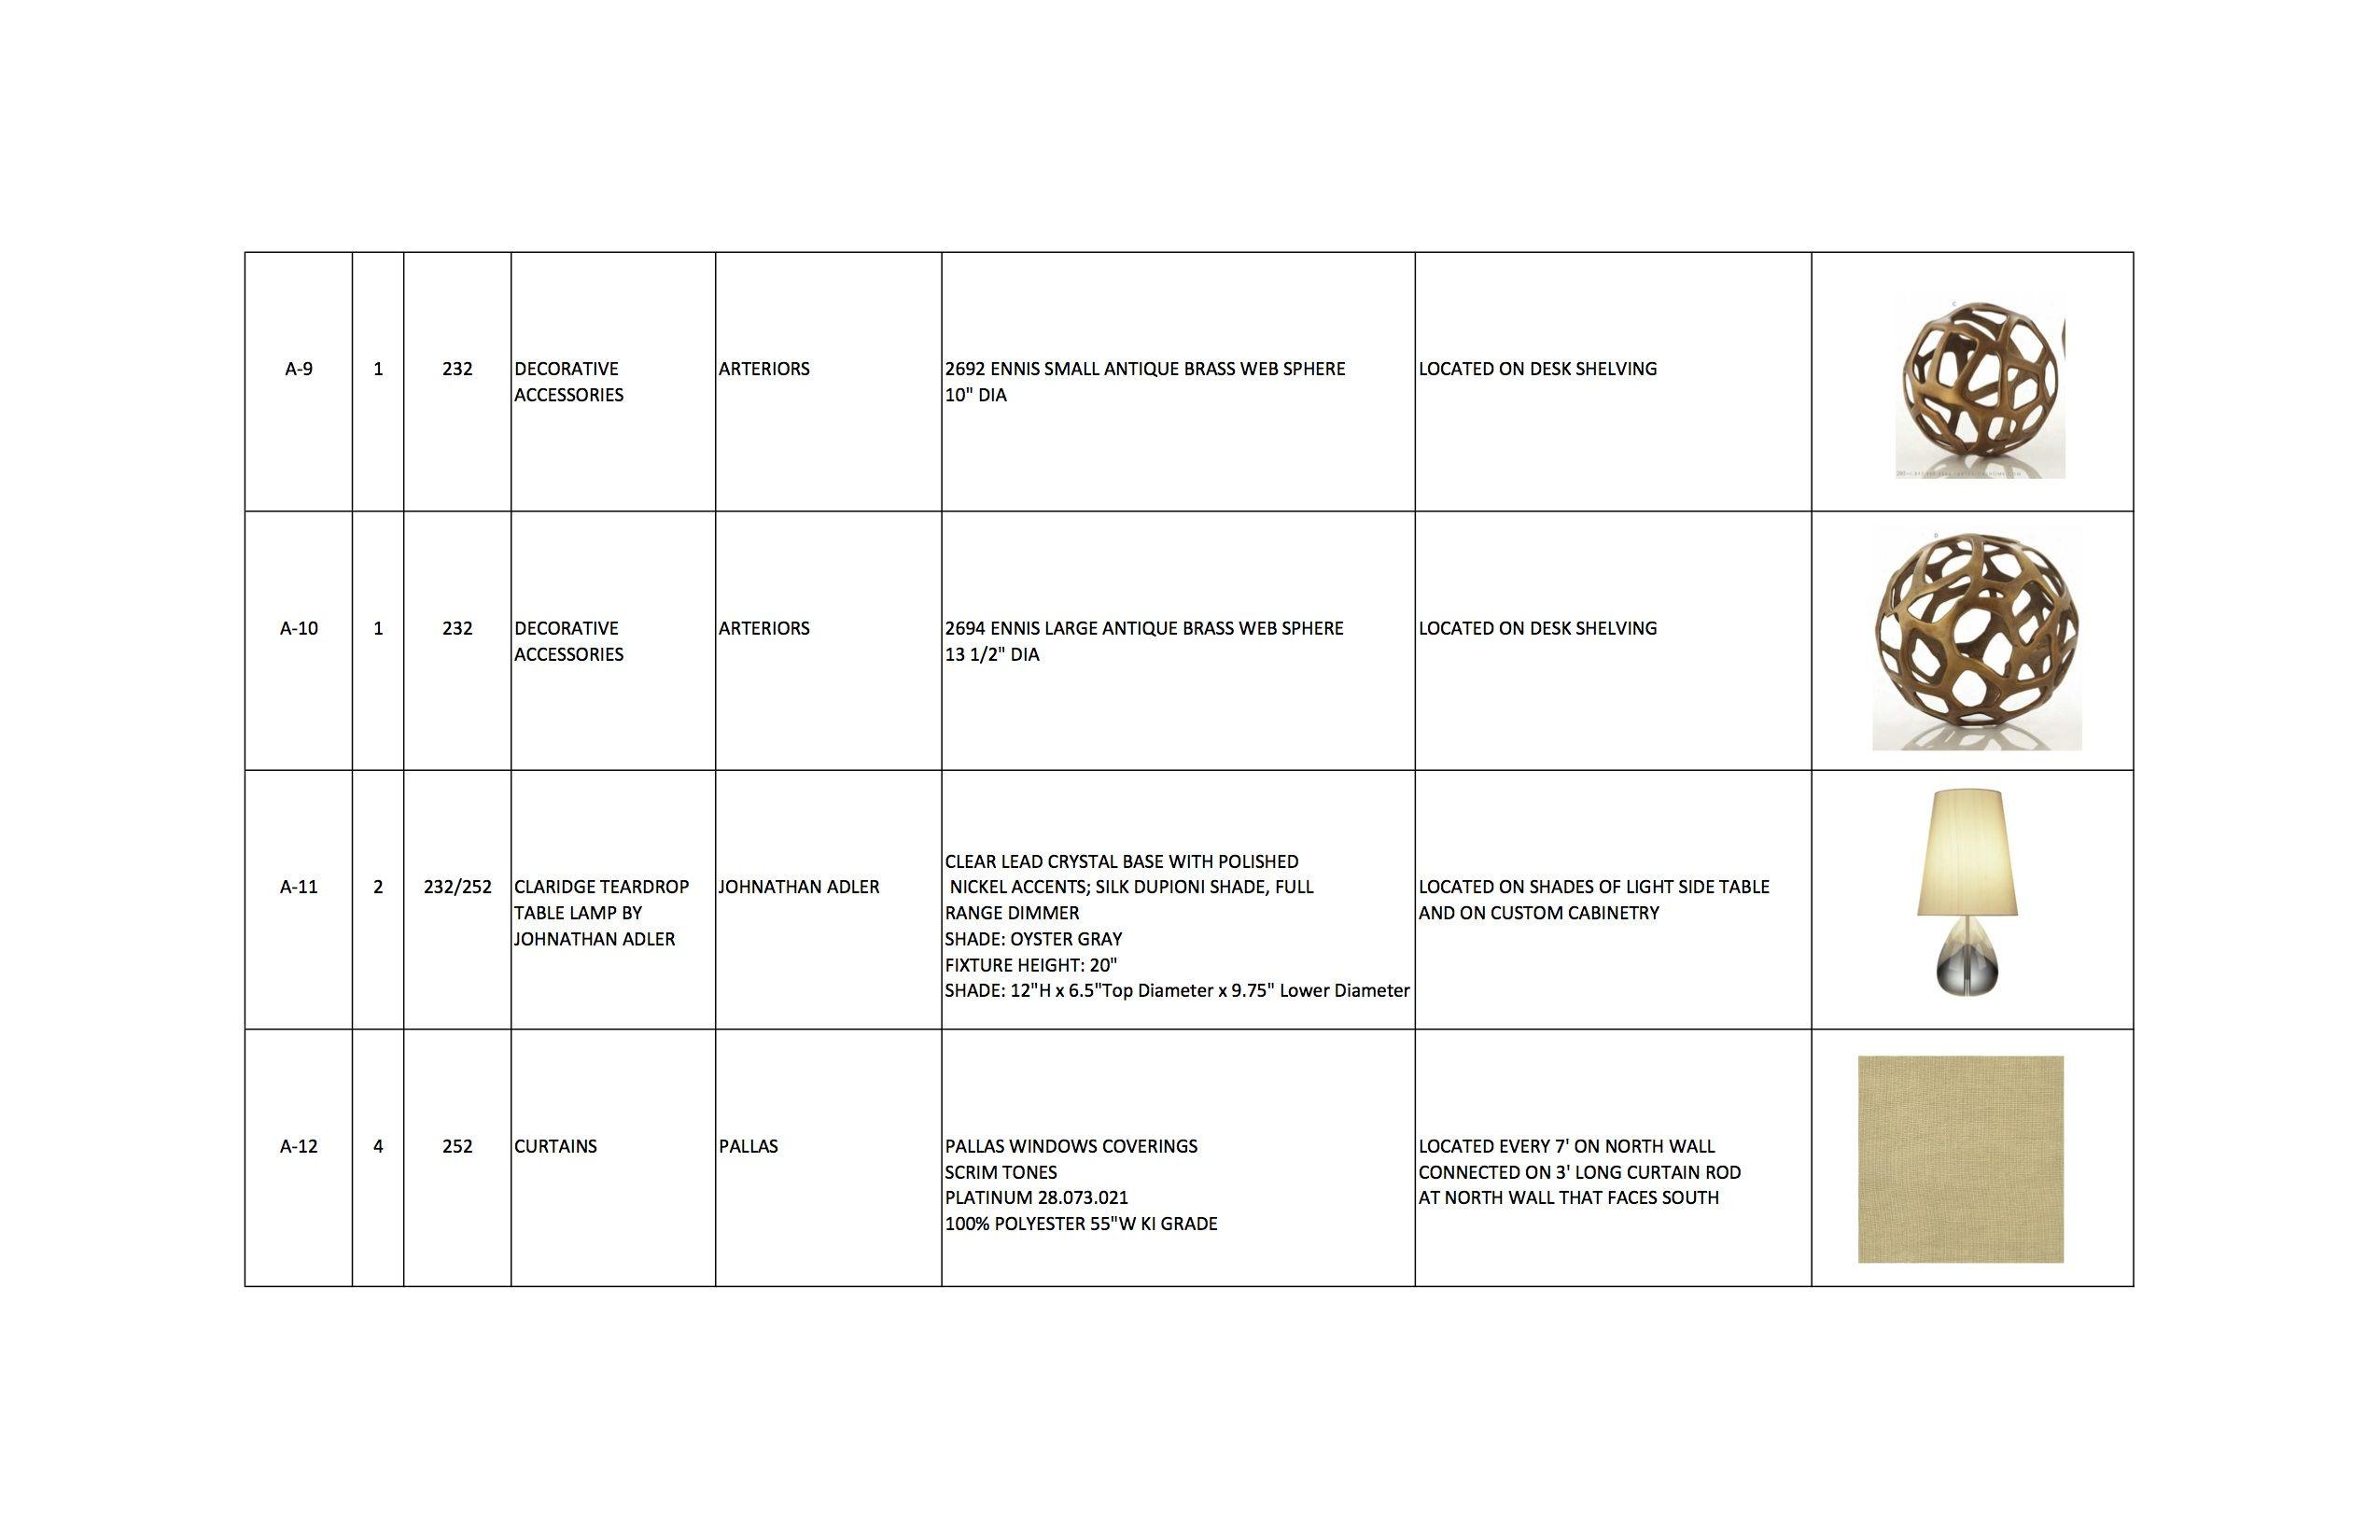 Interior Design Furniture Schedule Example With Images